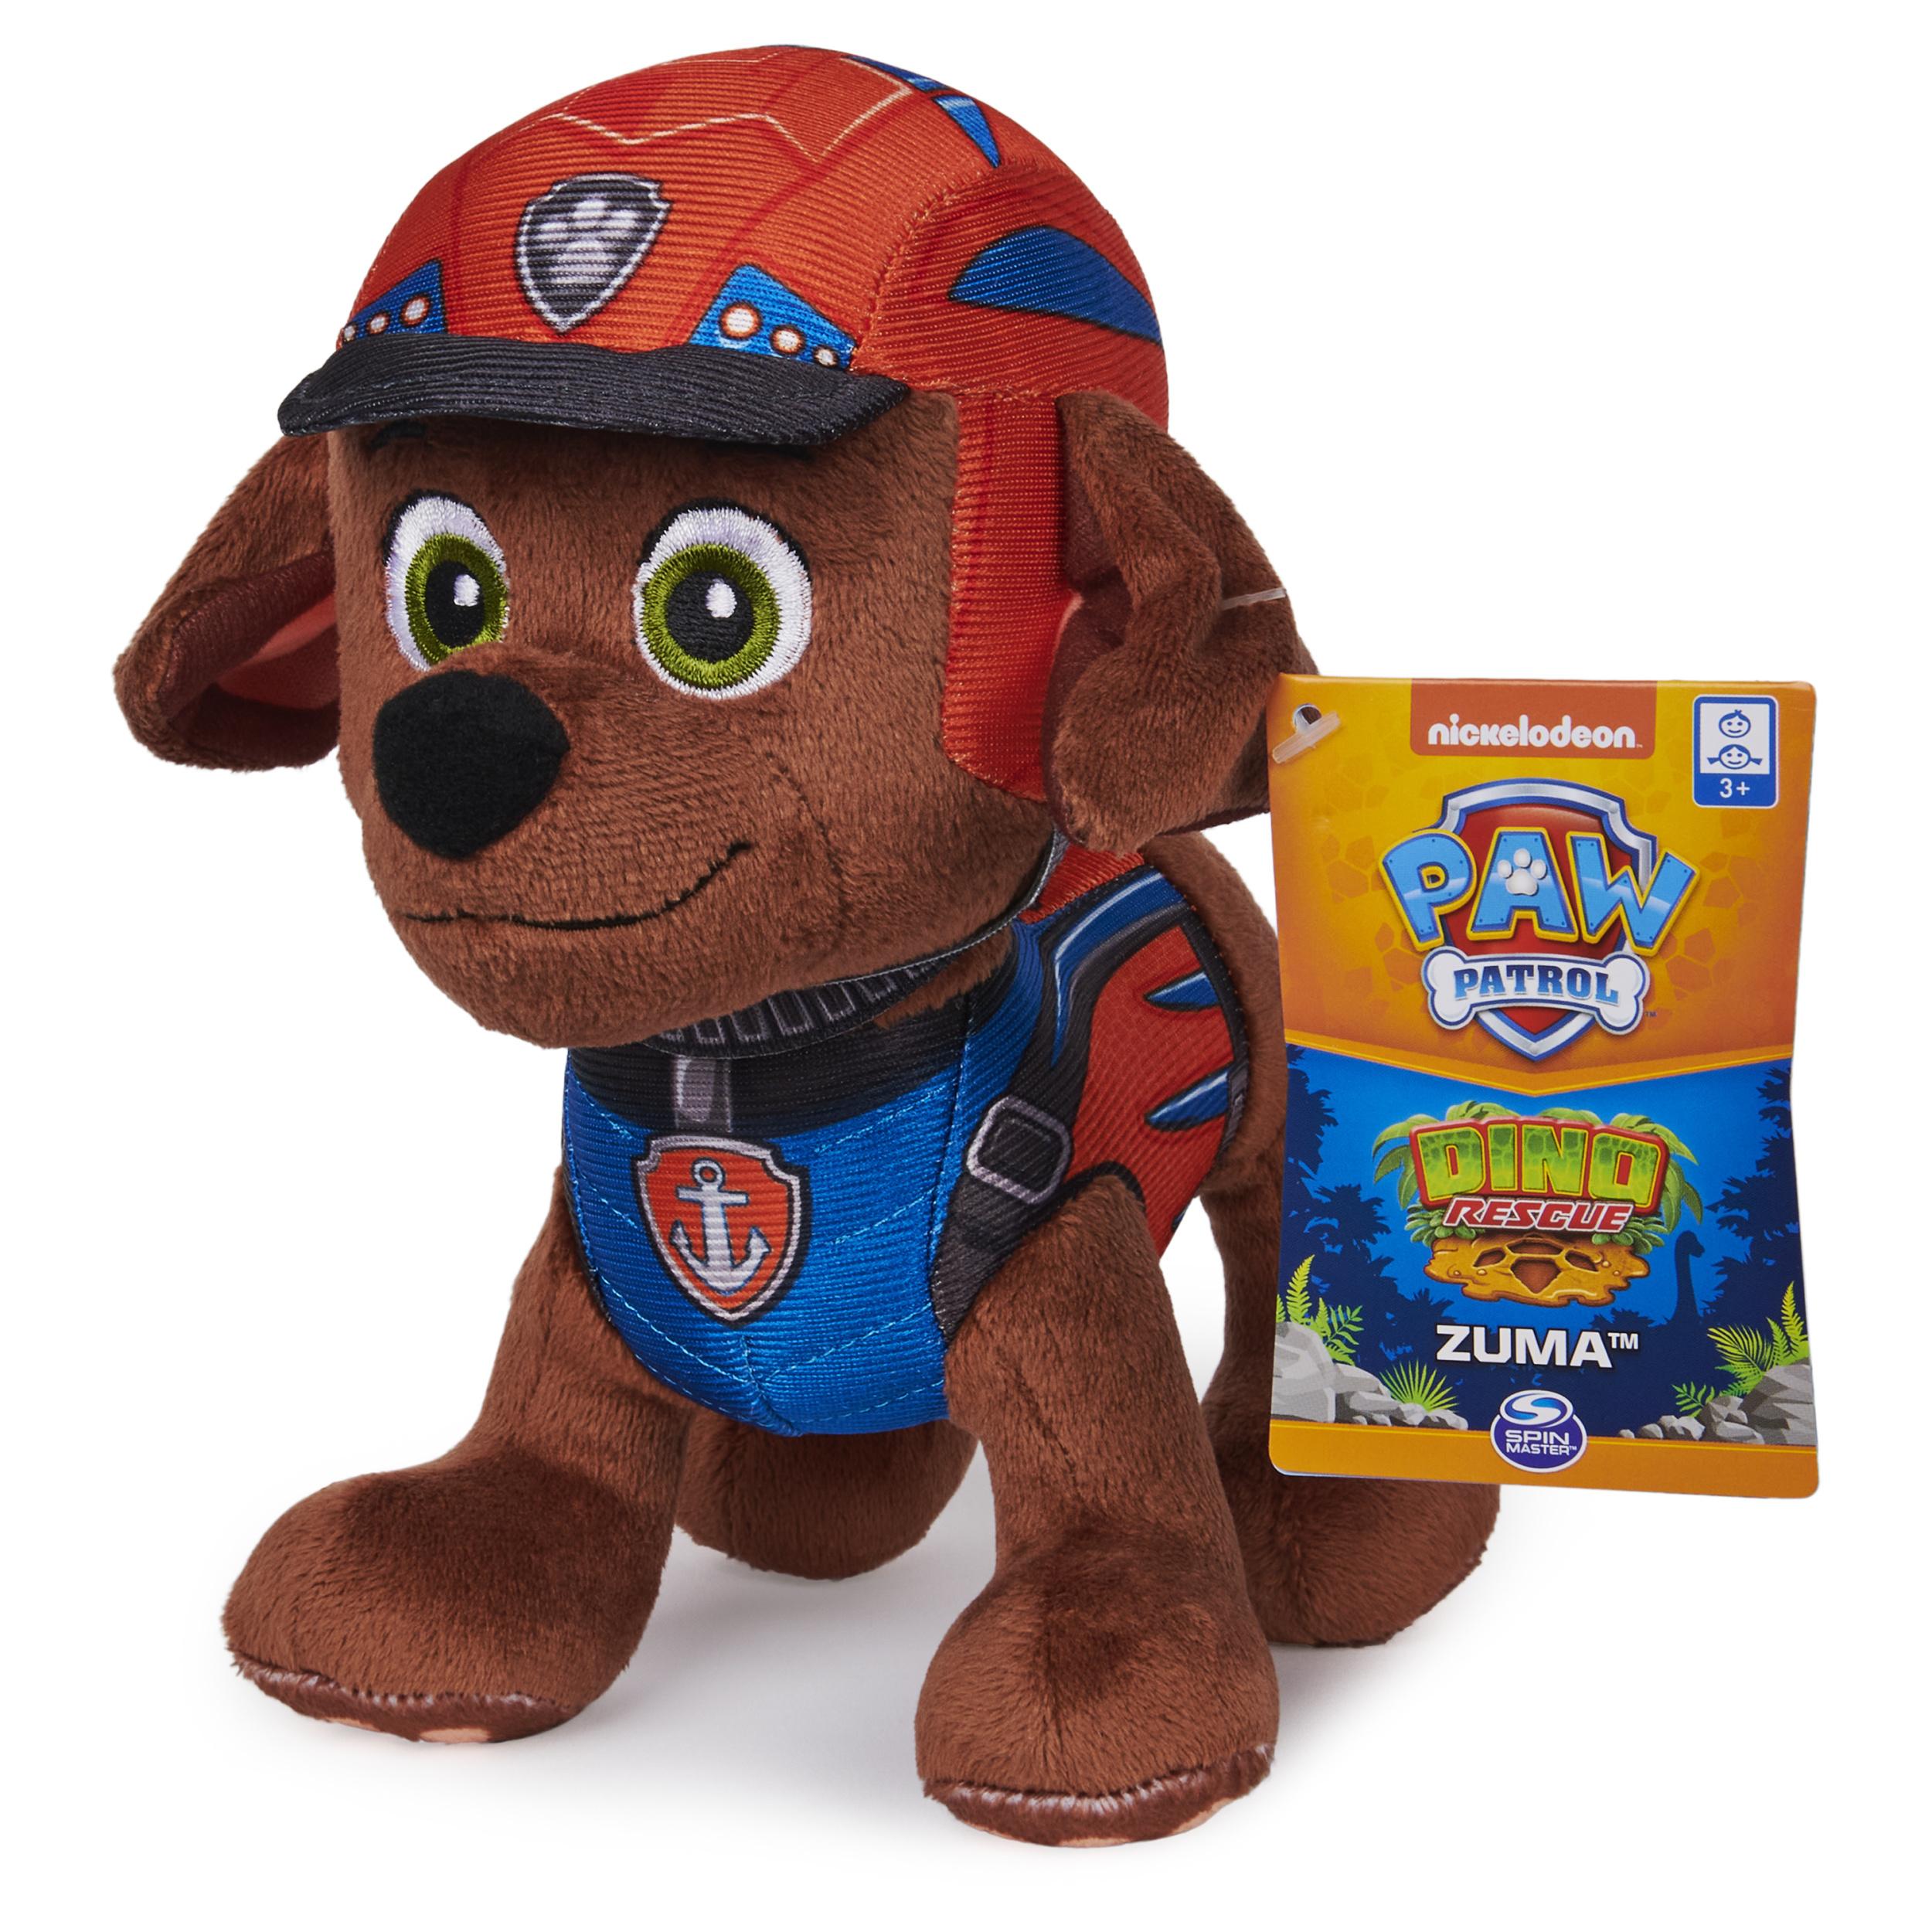 Nickelodeon Paw Patrol Chase Dino Rescue Plush